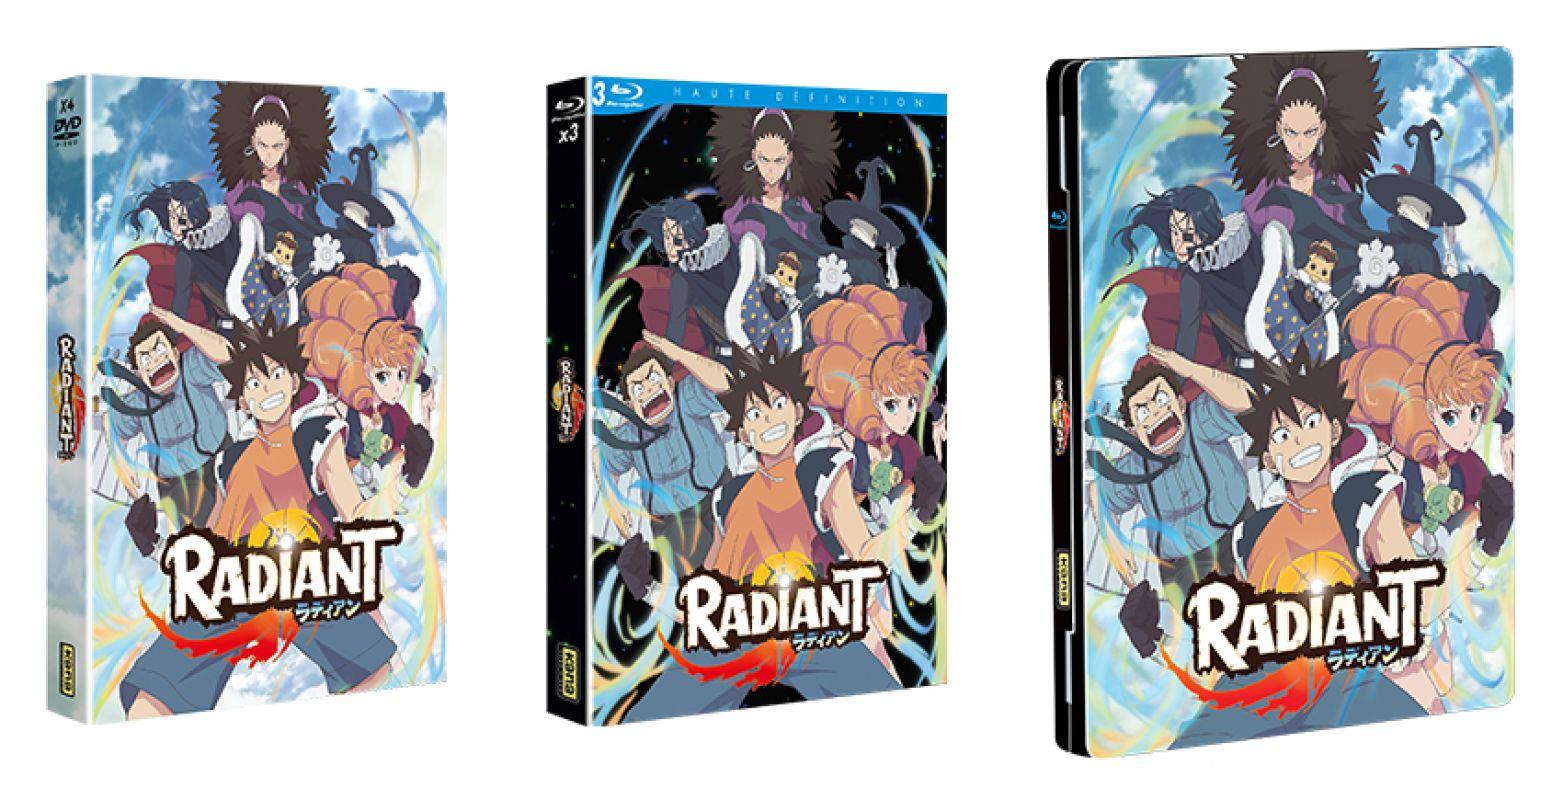 L'animé Radiant en blu-ray et DVD